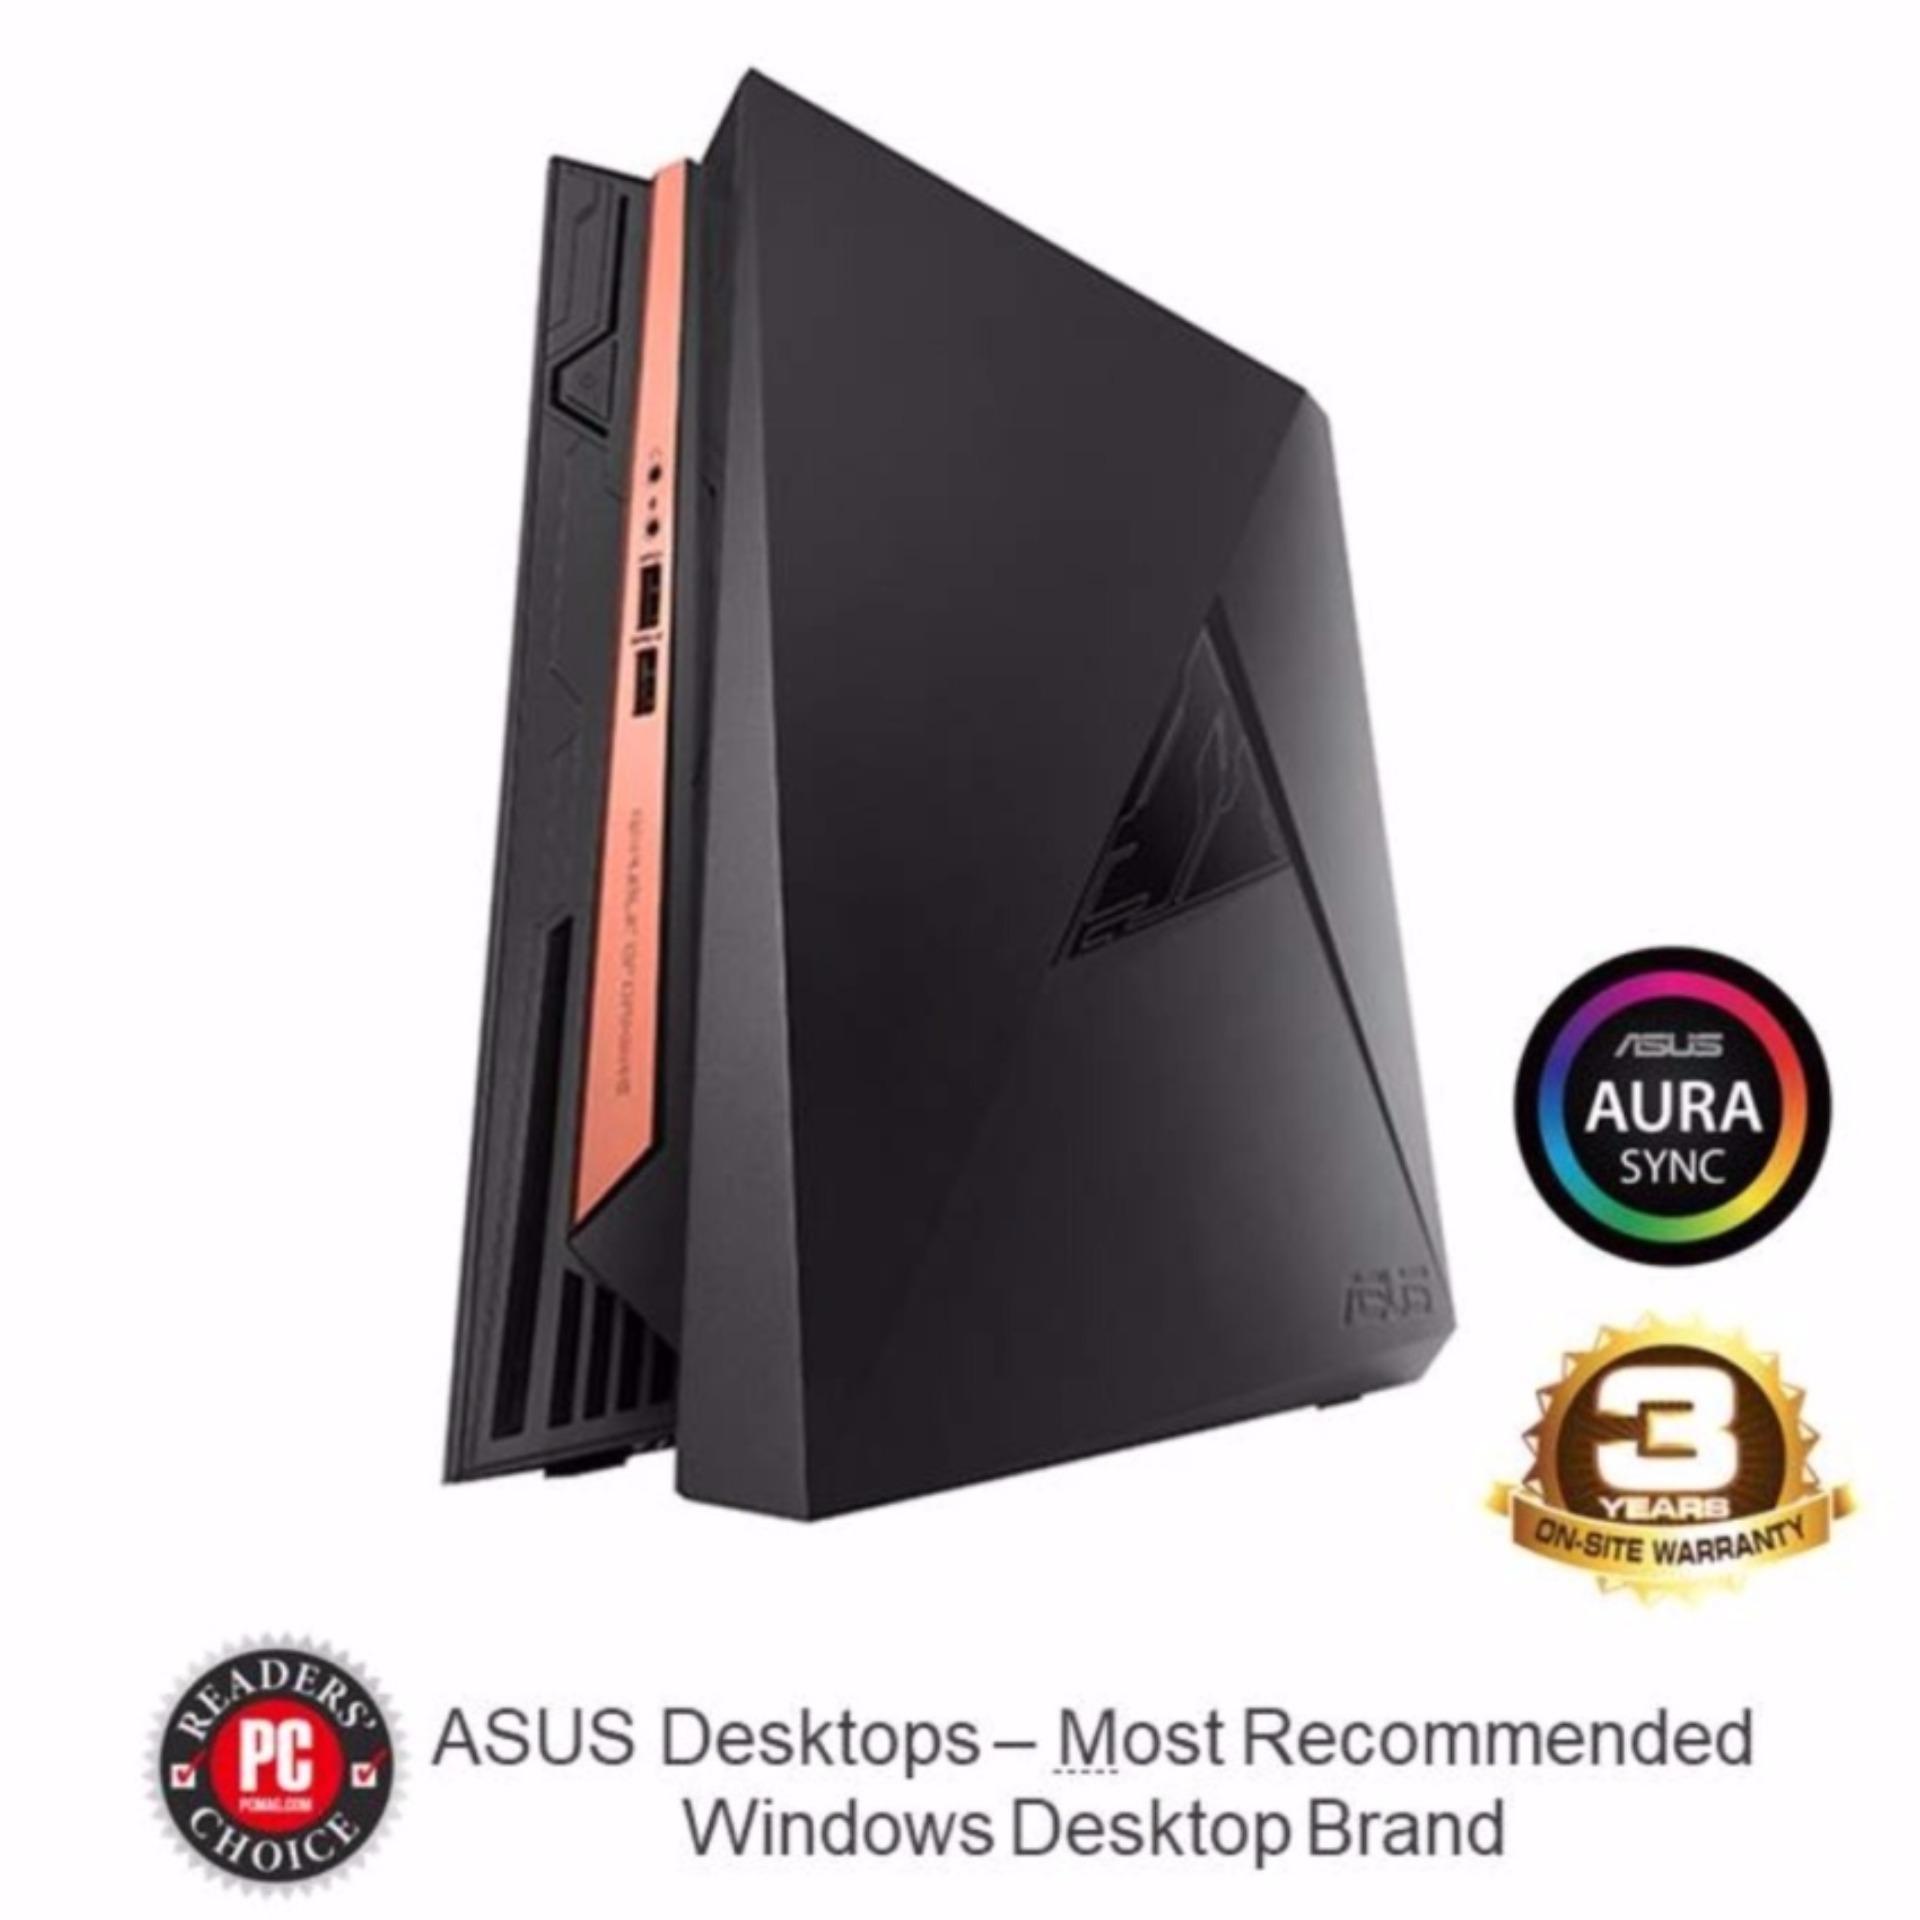 Asus GR8 II-T081Z ROG (Intel i7, 16GB RAM, 1TB HDD + 256GB SSD GTX1060(3G)